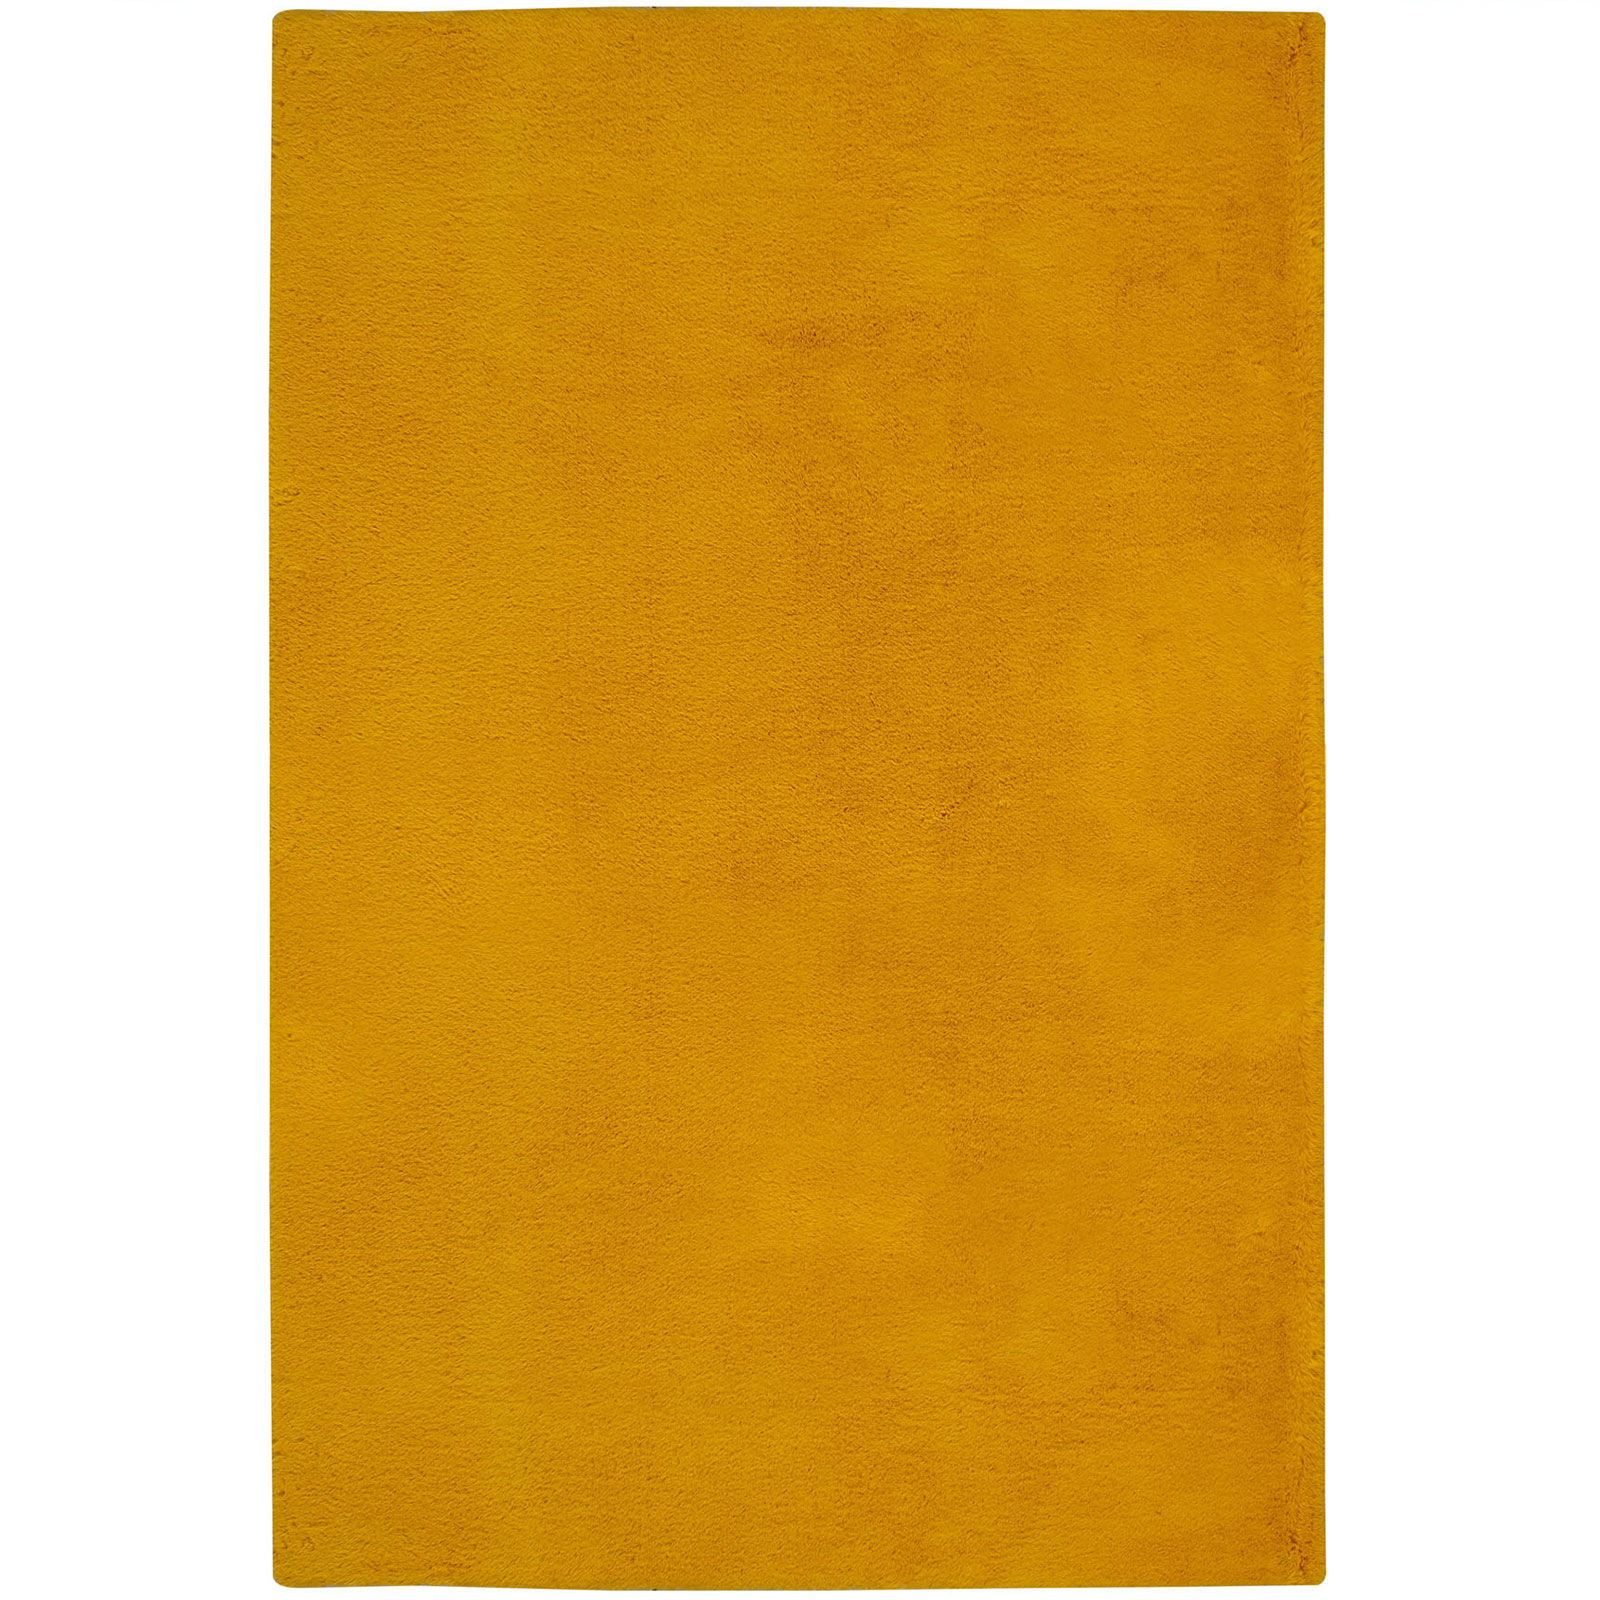 Comfy-Mustard-Overhead.jpg